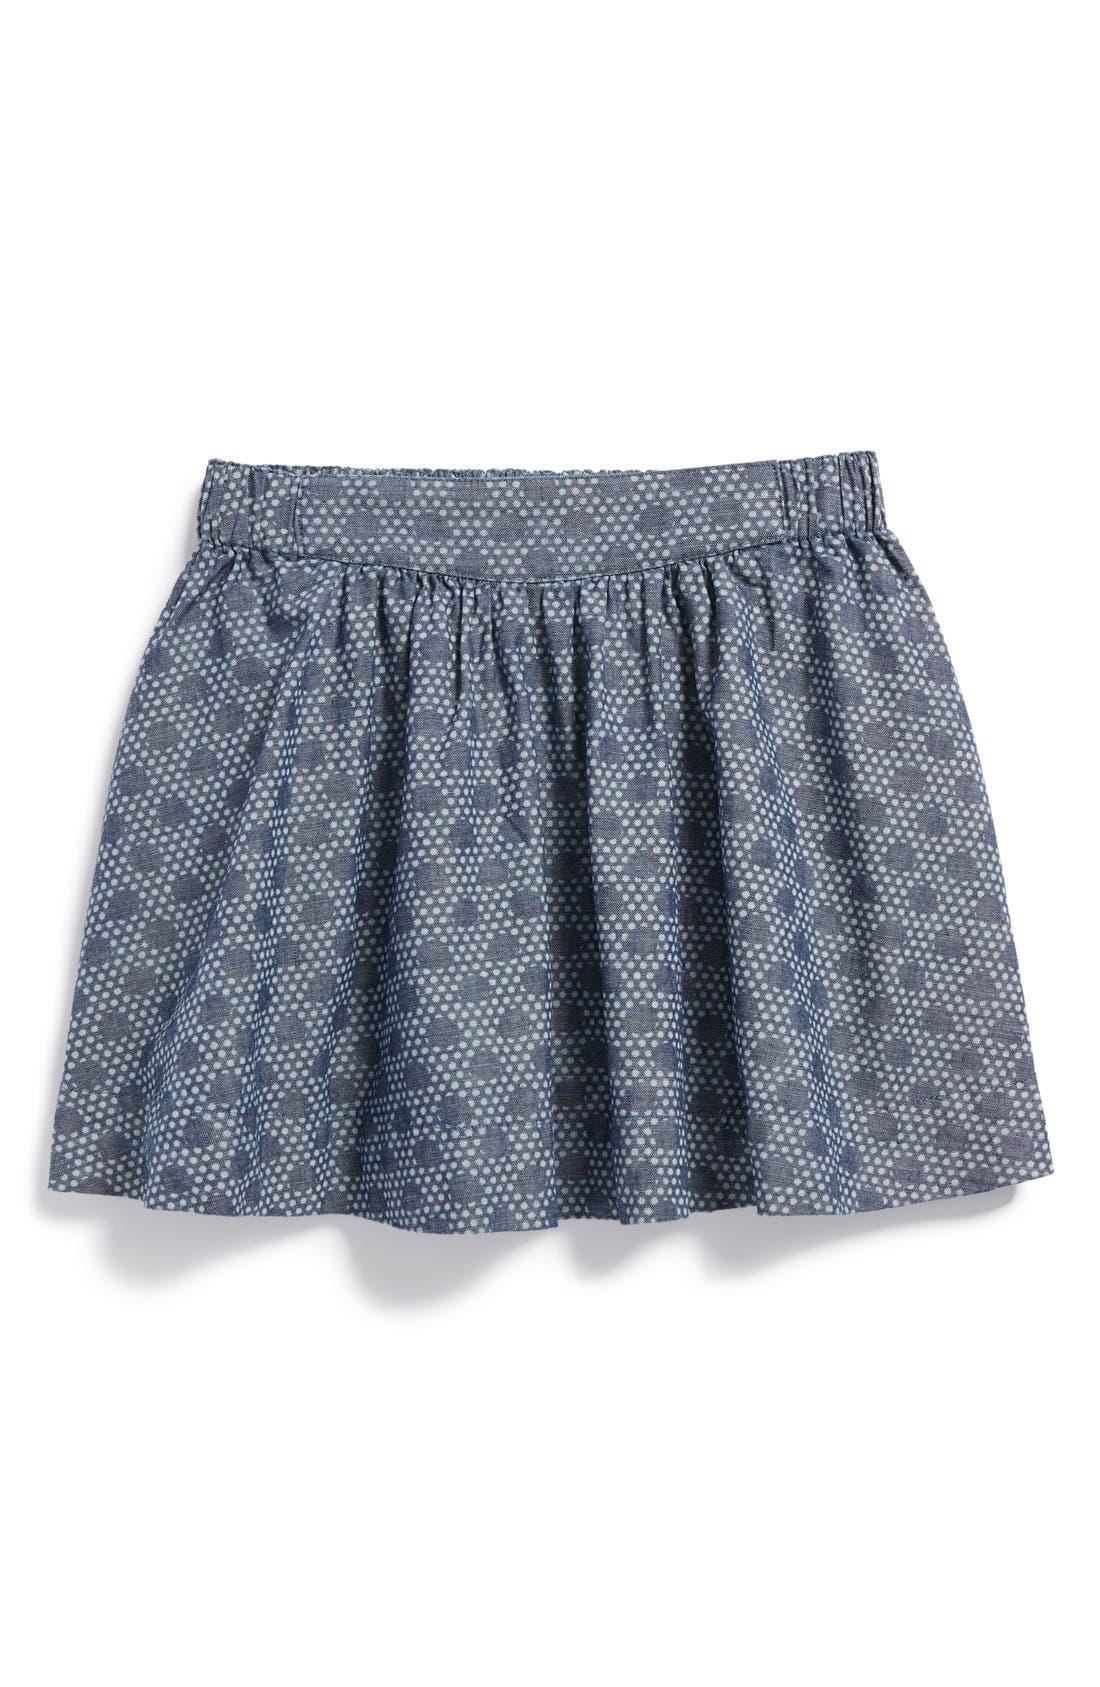 'Unity' Chambray Twirl Skirt,                             Main thumbnail 1, color,                             410